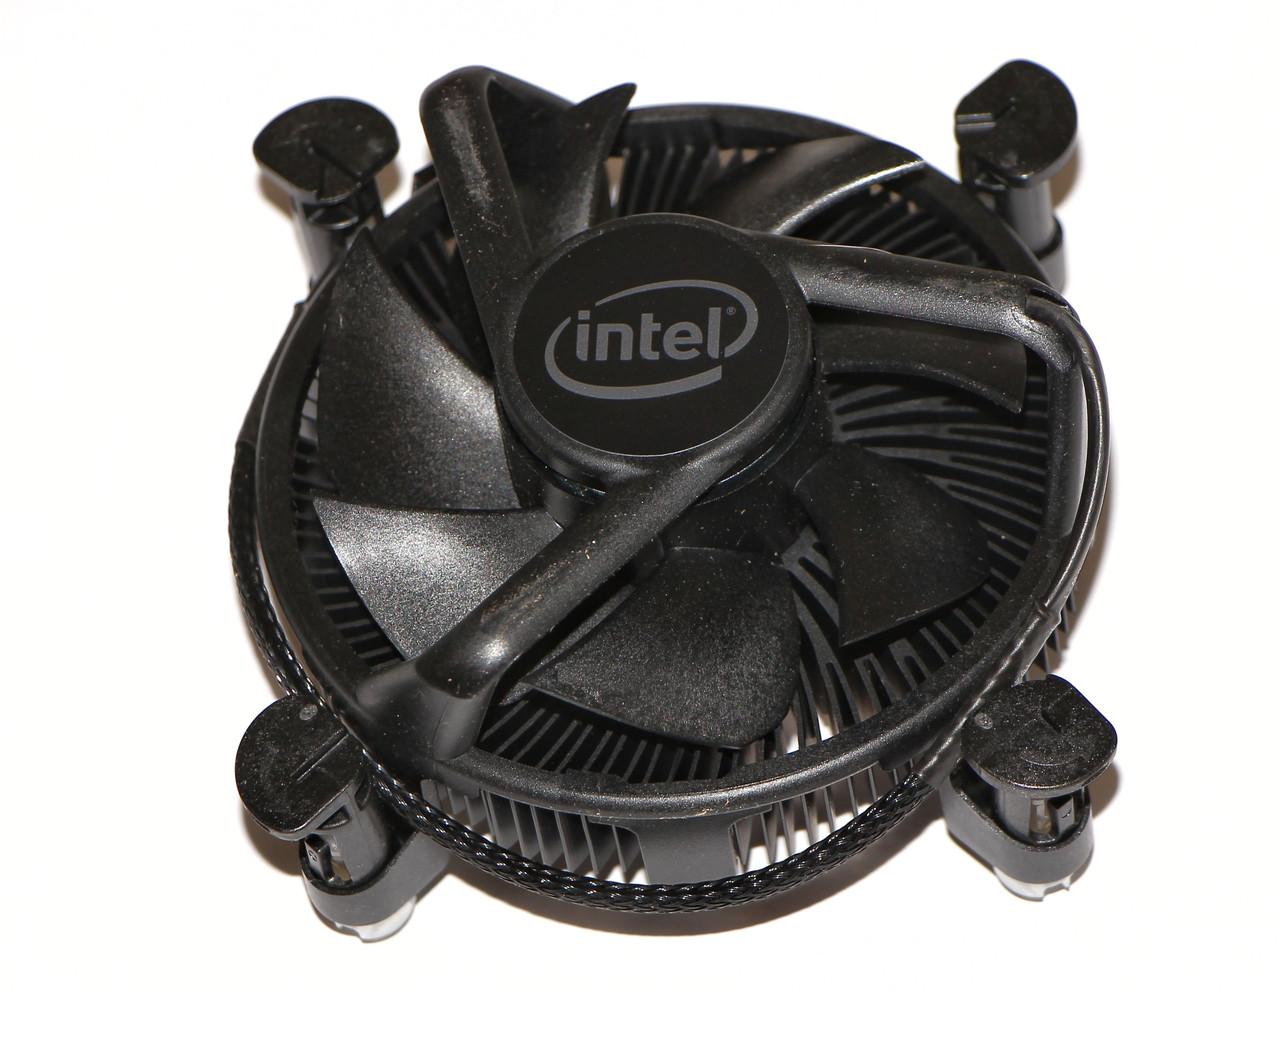 Кулер Intel s1156 s1155 s1150, медь (новый) 95вт